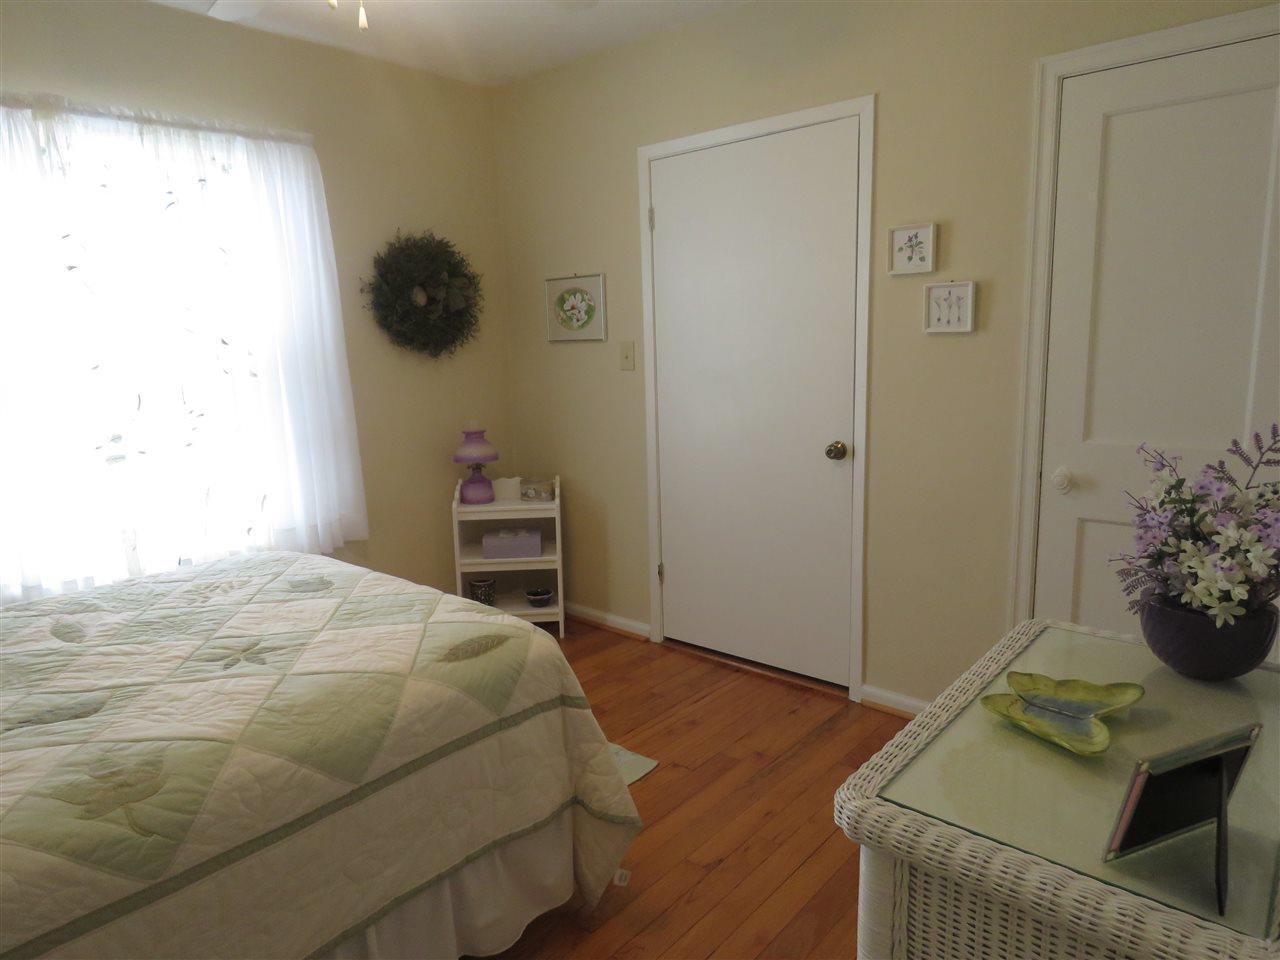 509 W Sunset Ave, Pensacola, FL 32507